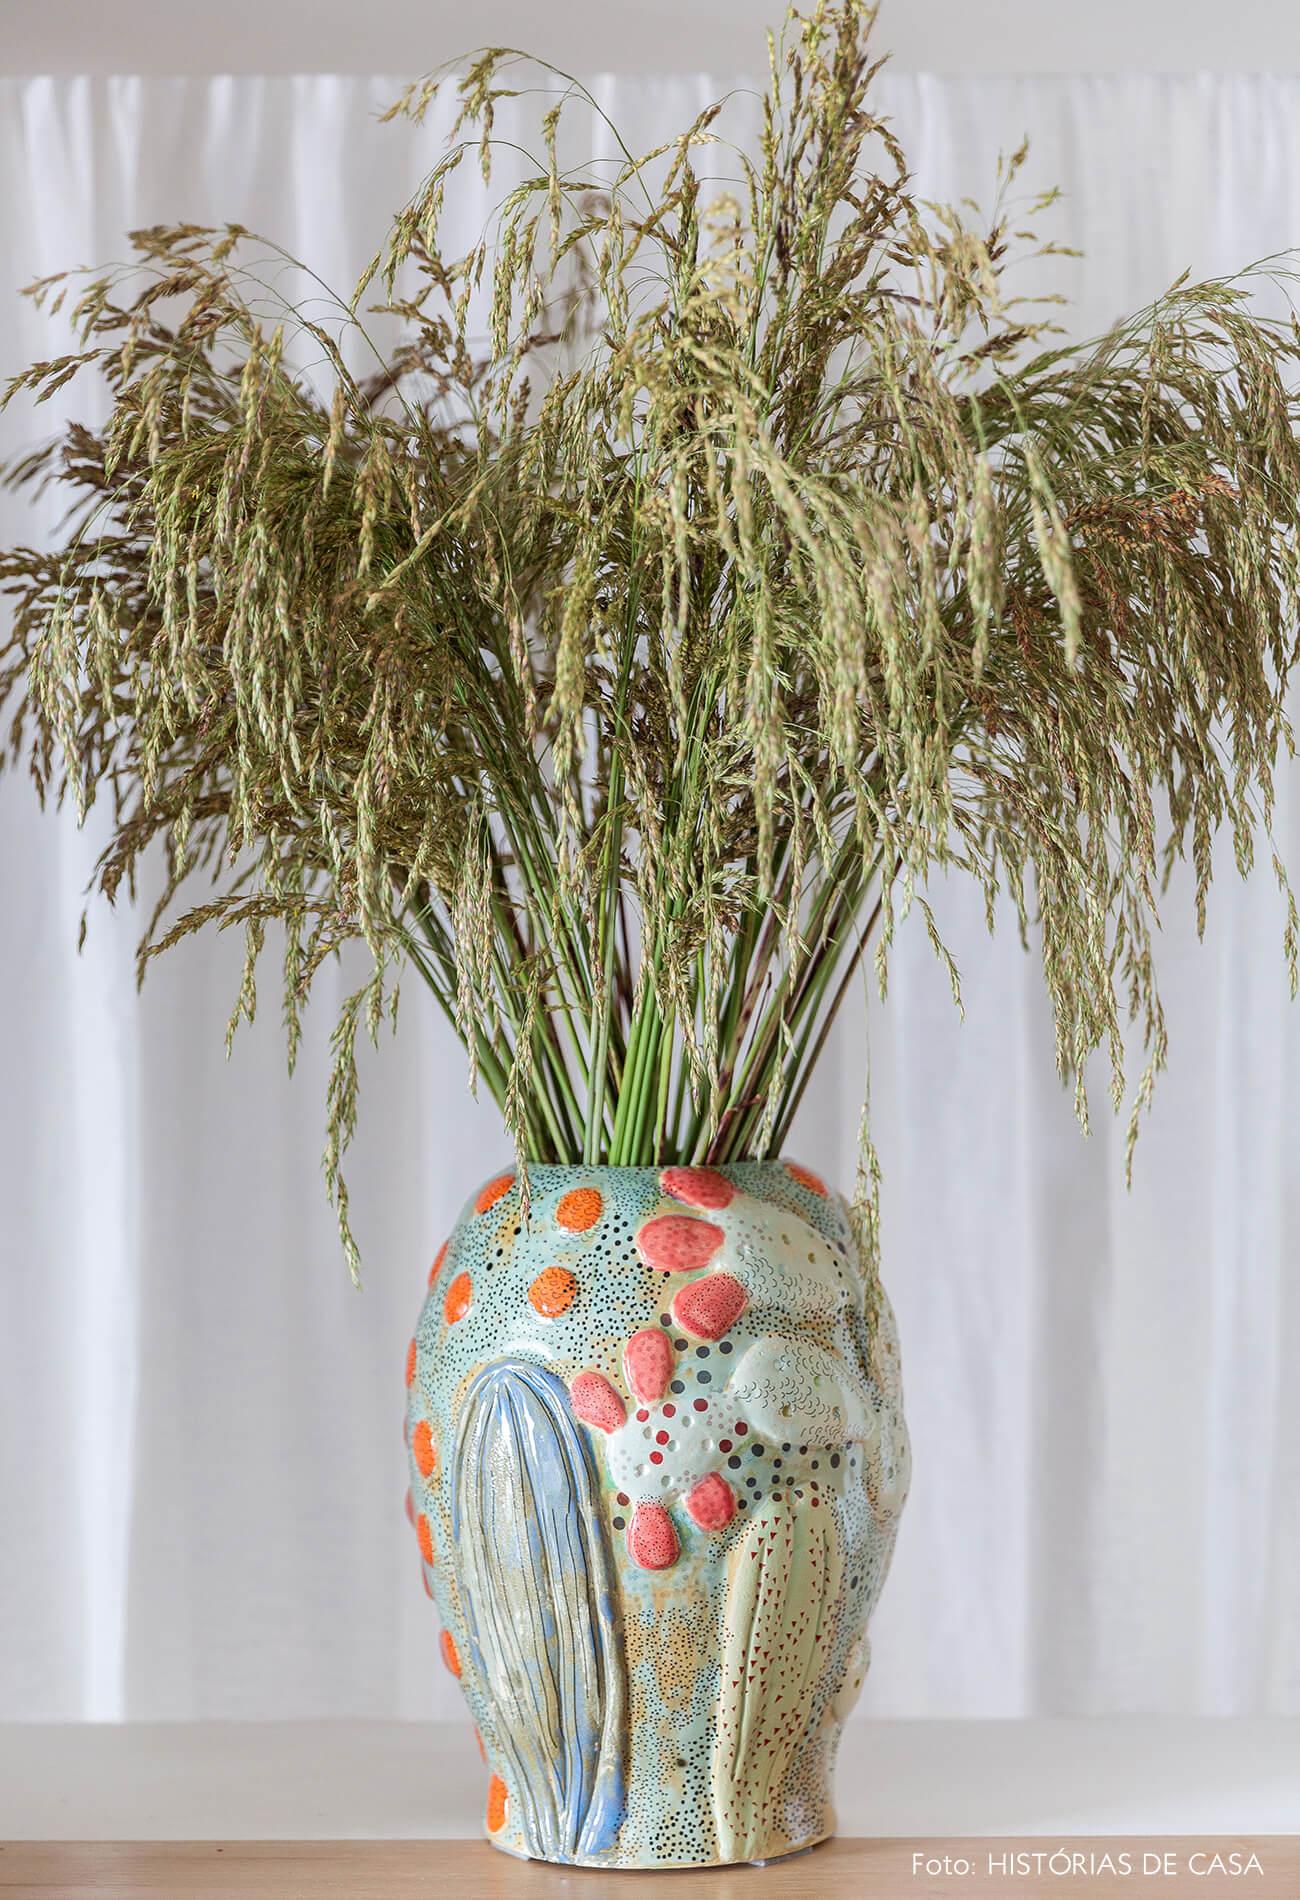 Vaso colorido com arranjo de flores secas